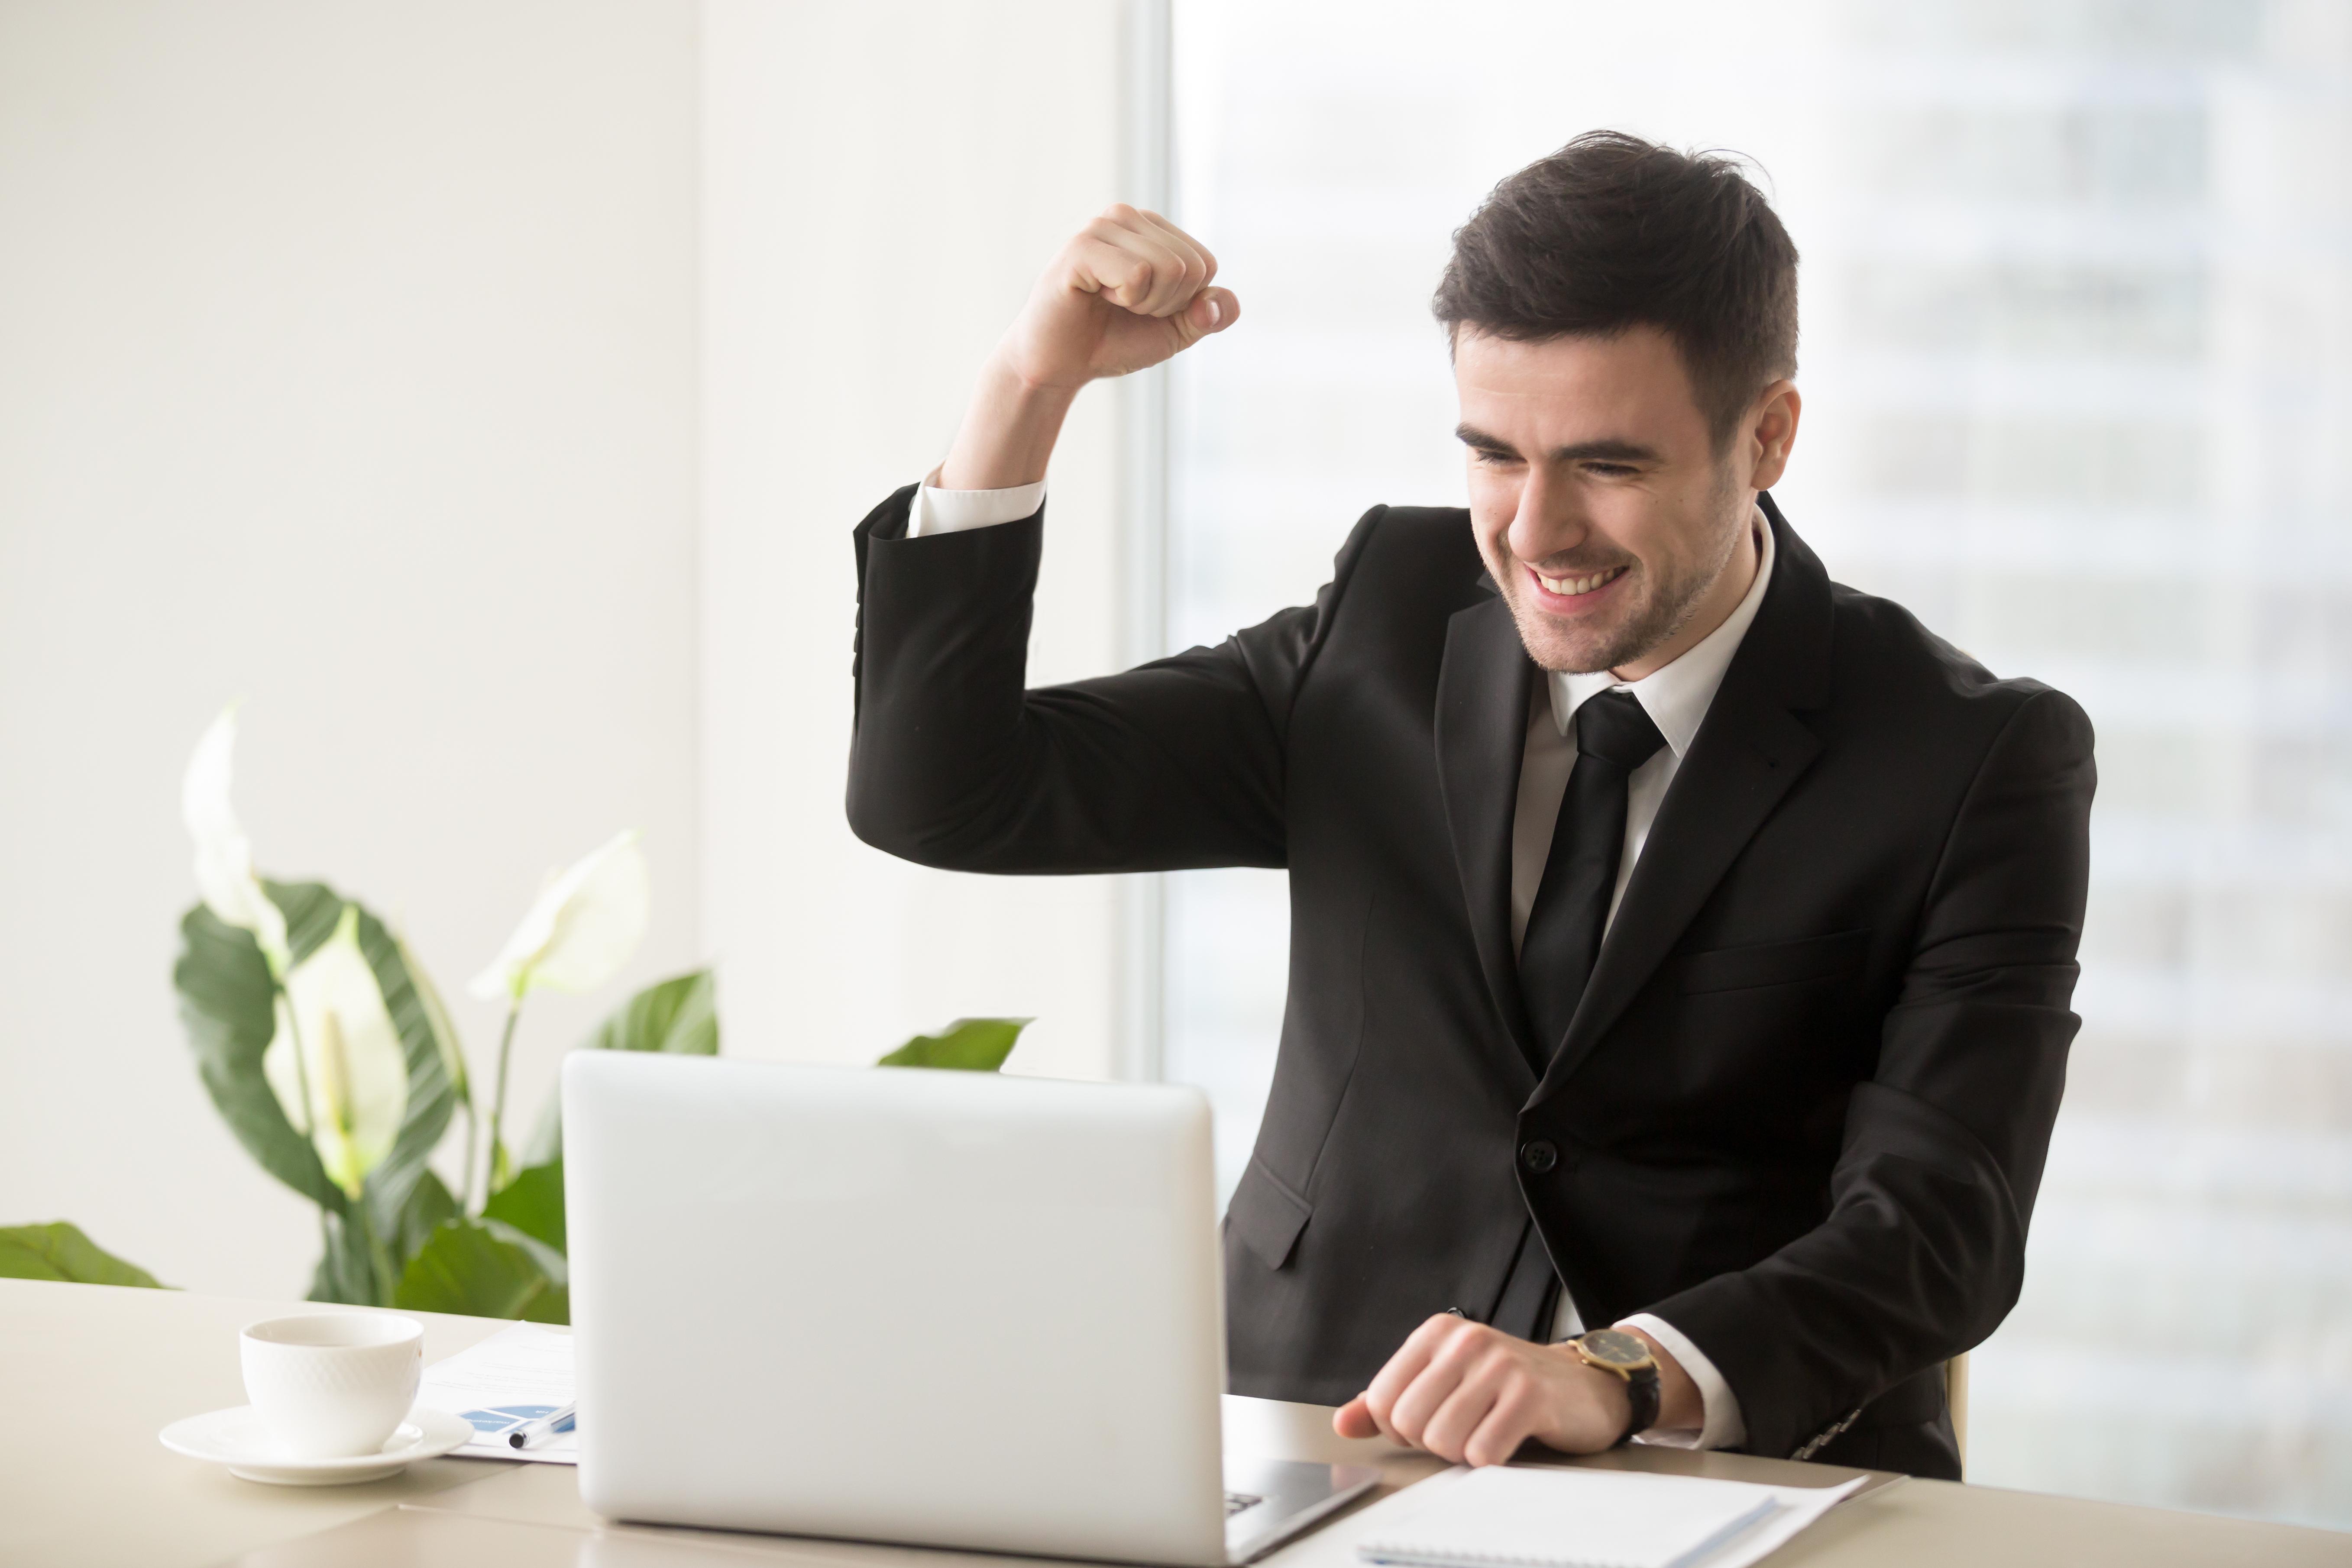 crescita-professionale-lavoro